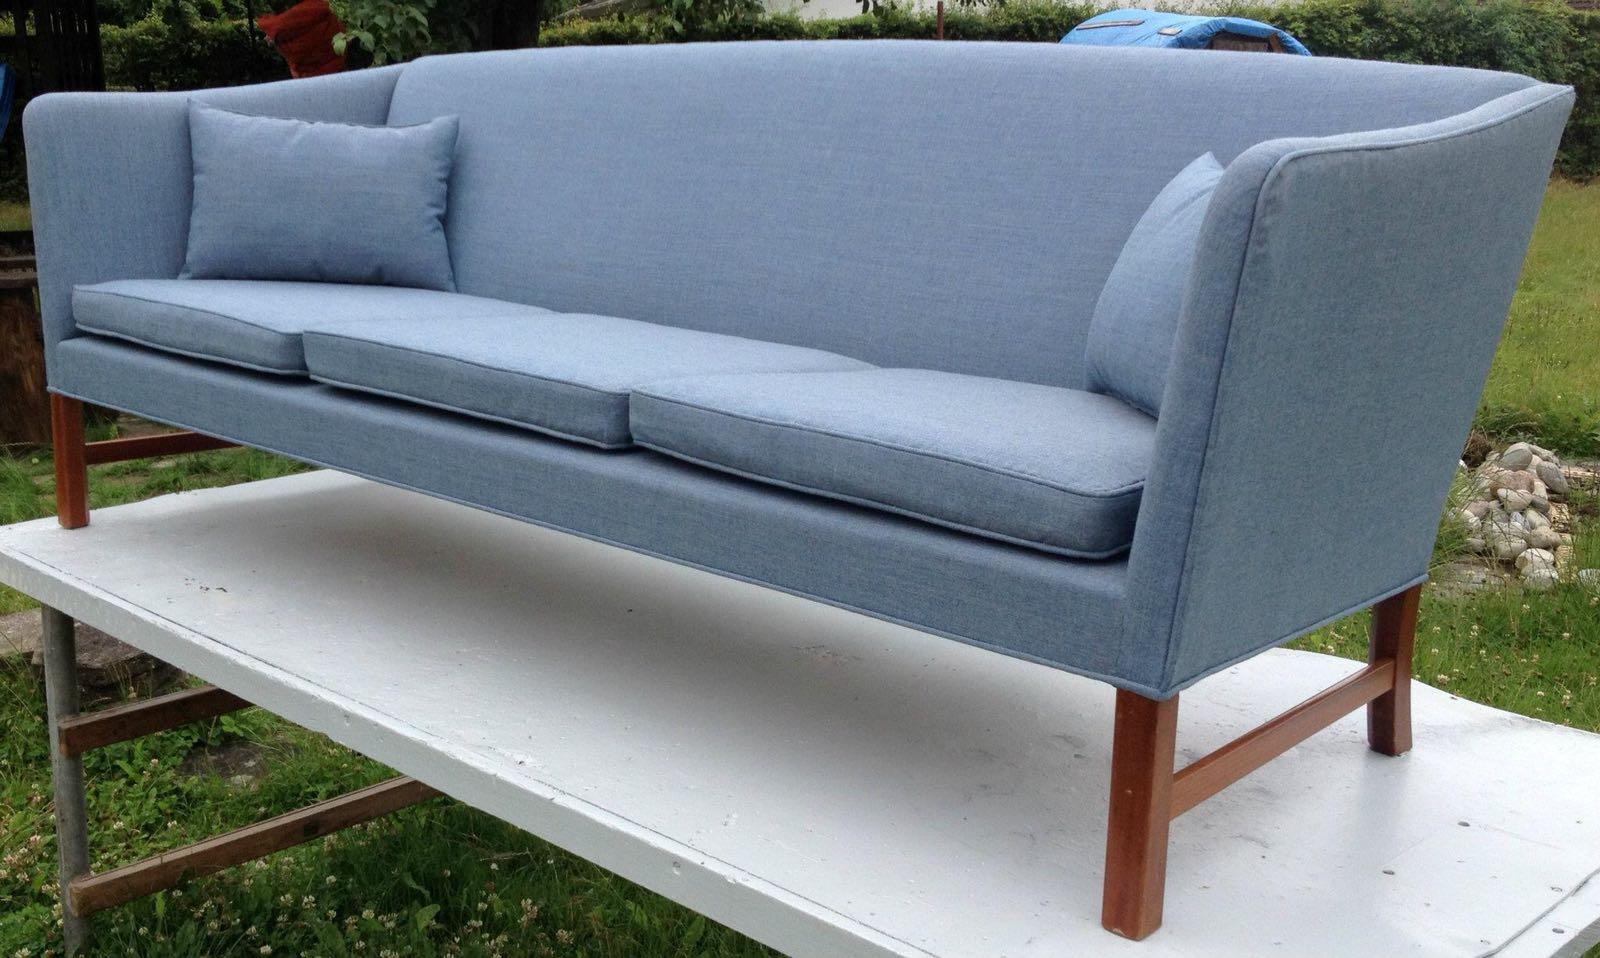 Ole Wancher sofa ombetrakning